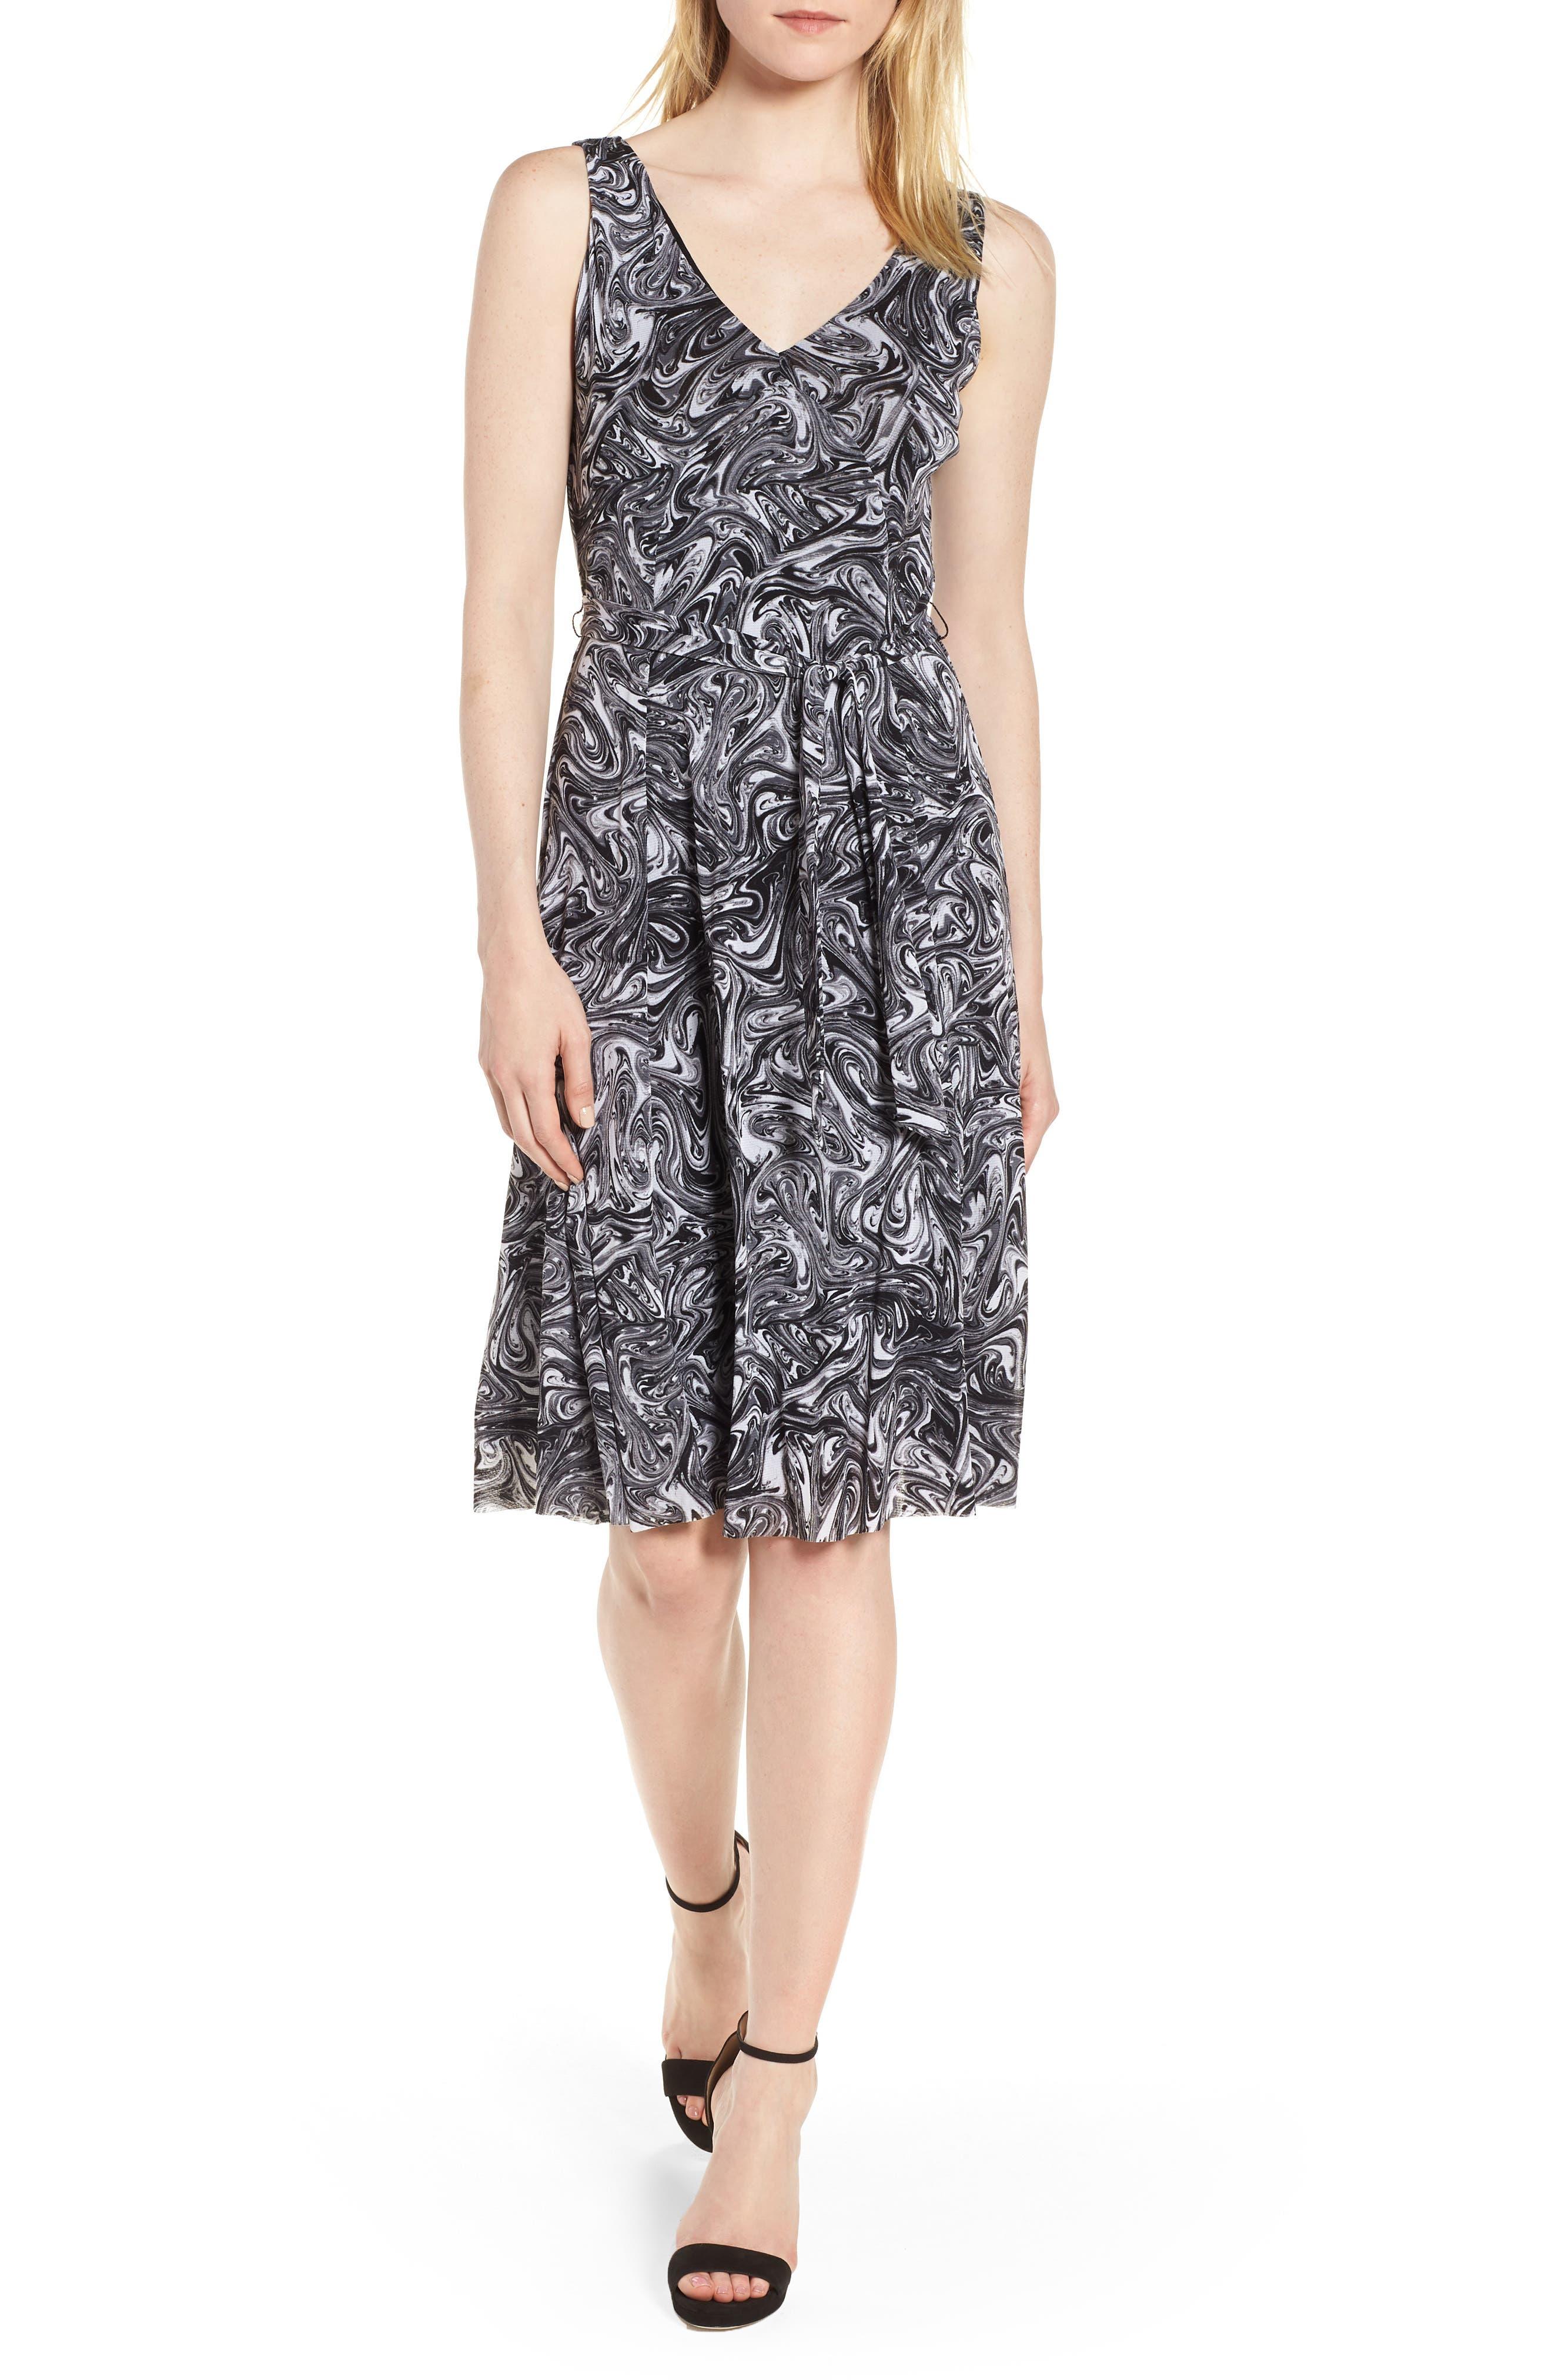 Watermark Swirl Flare Tank Dress,                             Main thumbnail 1, color,                             001